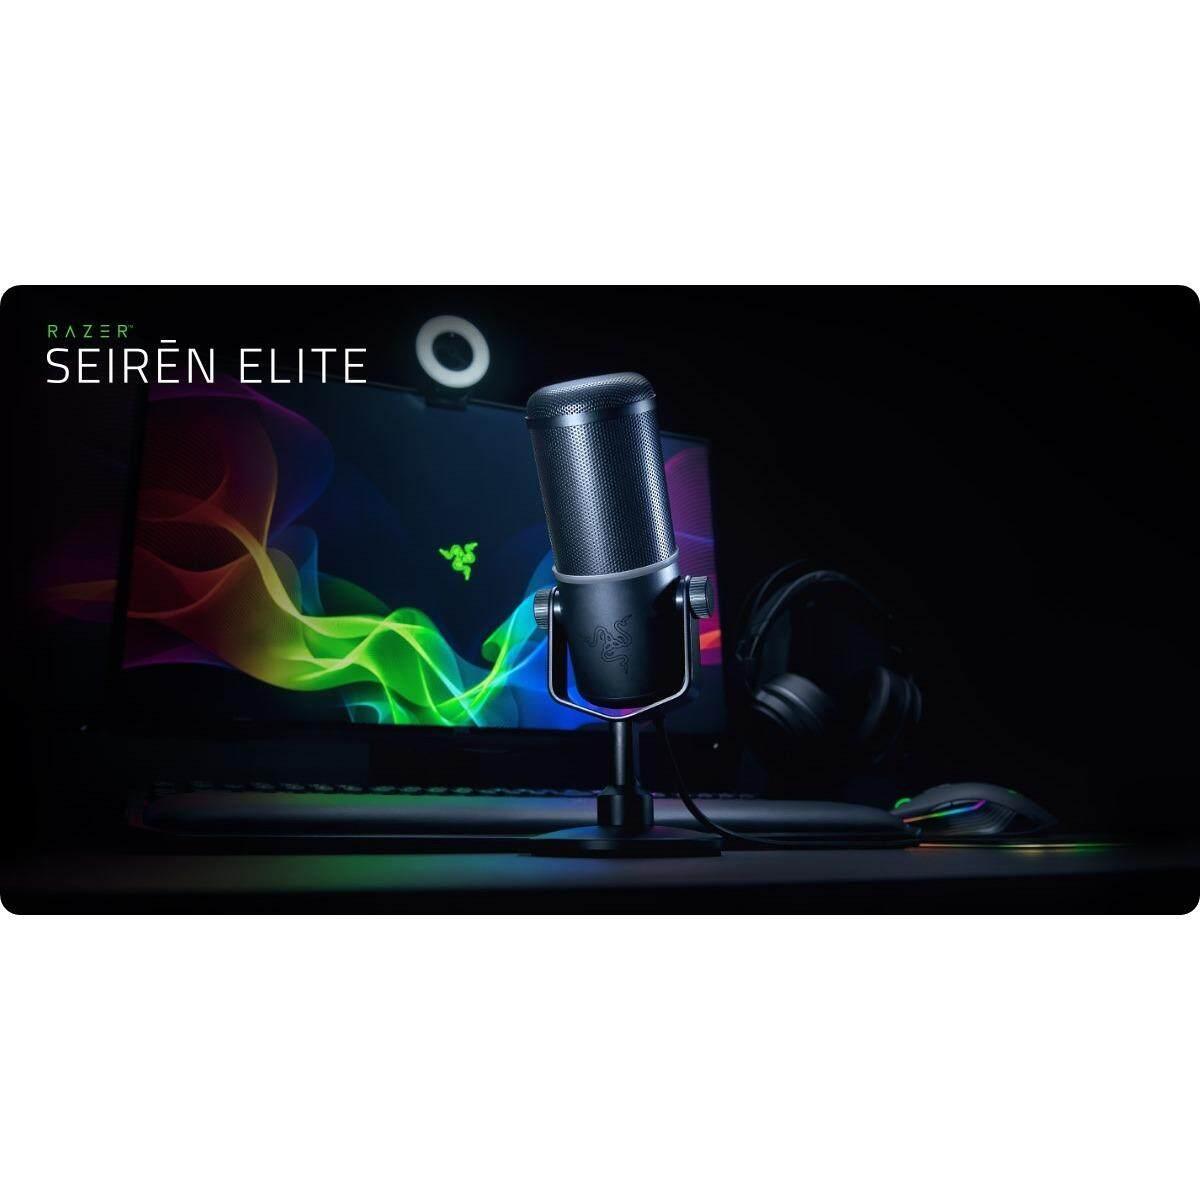 Razer Seiren Elite Streaming Microphone